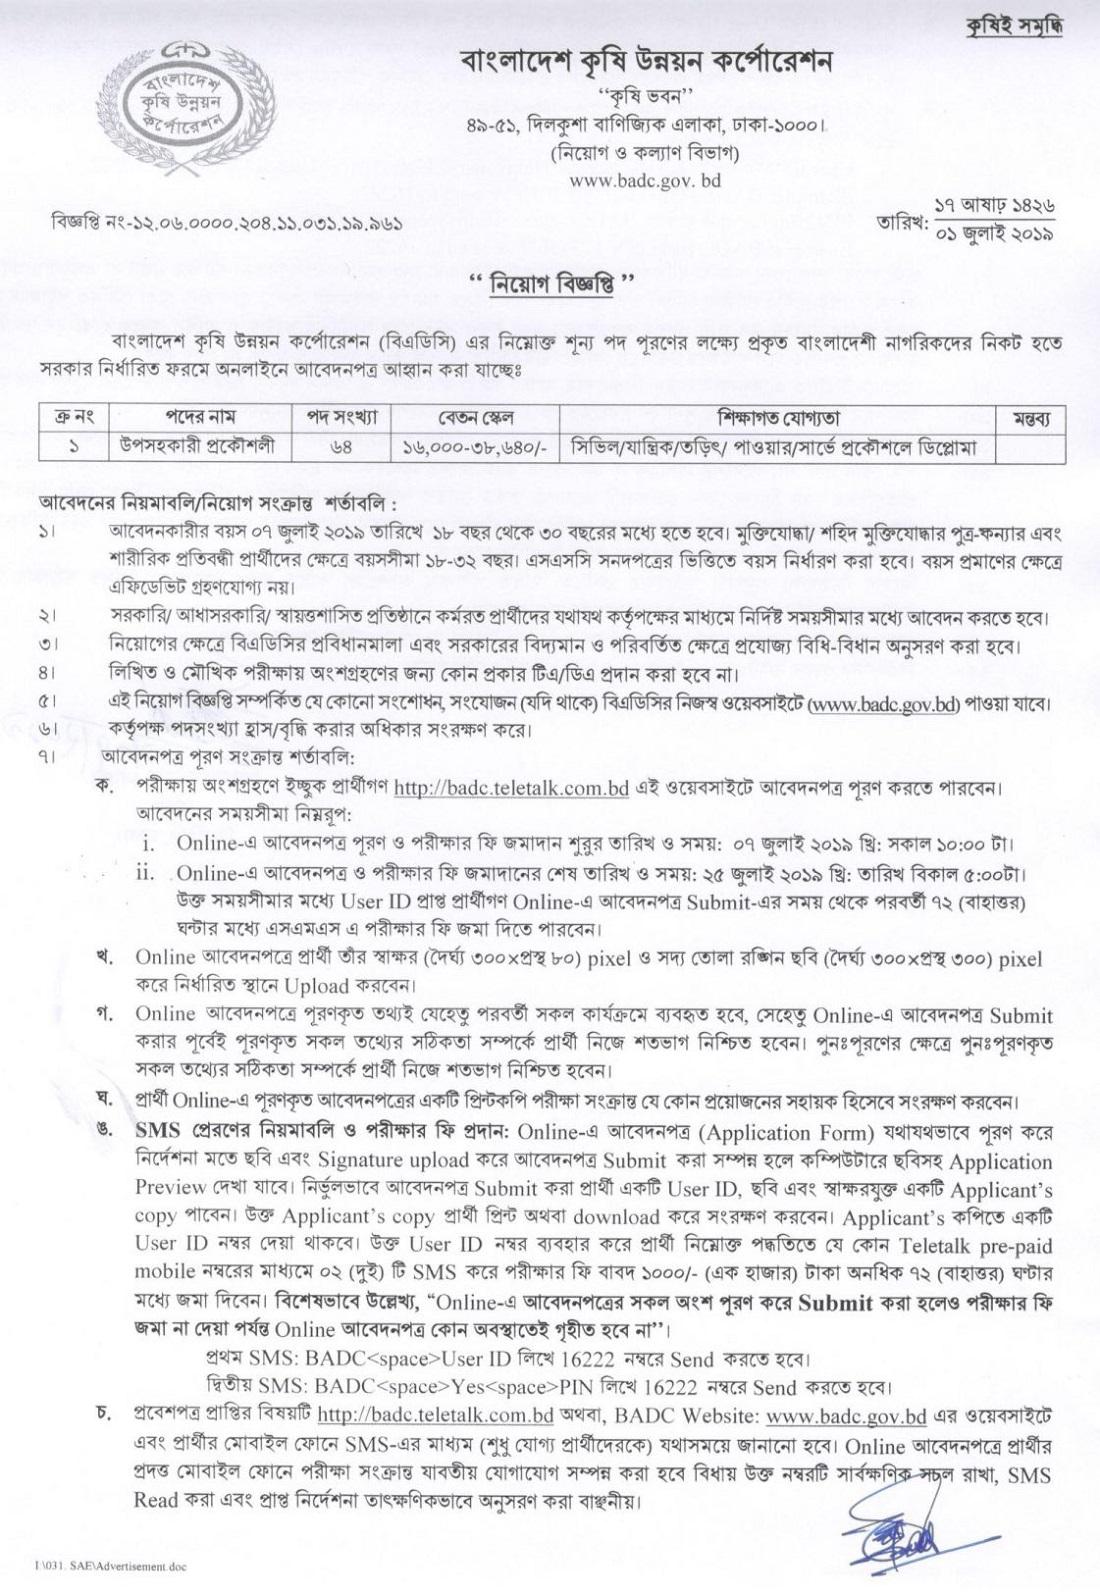 Bangladesh Agricultural Development Corporation Job Circular 2019